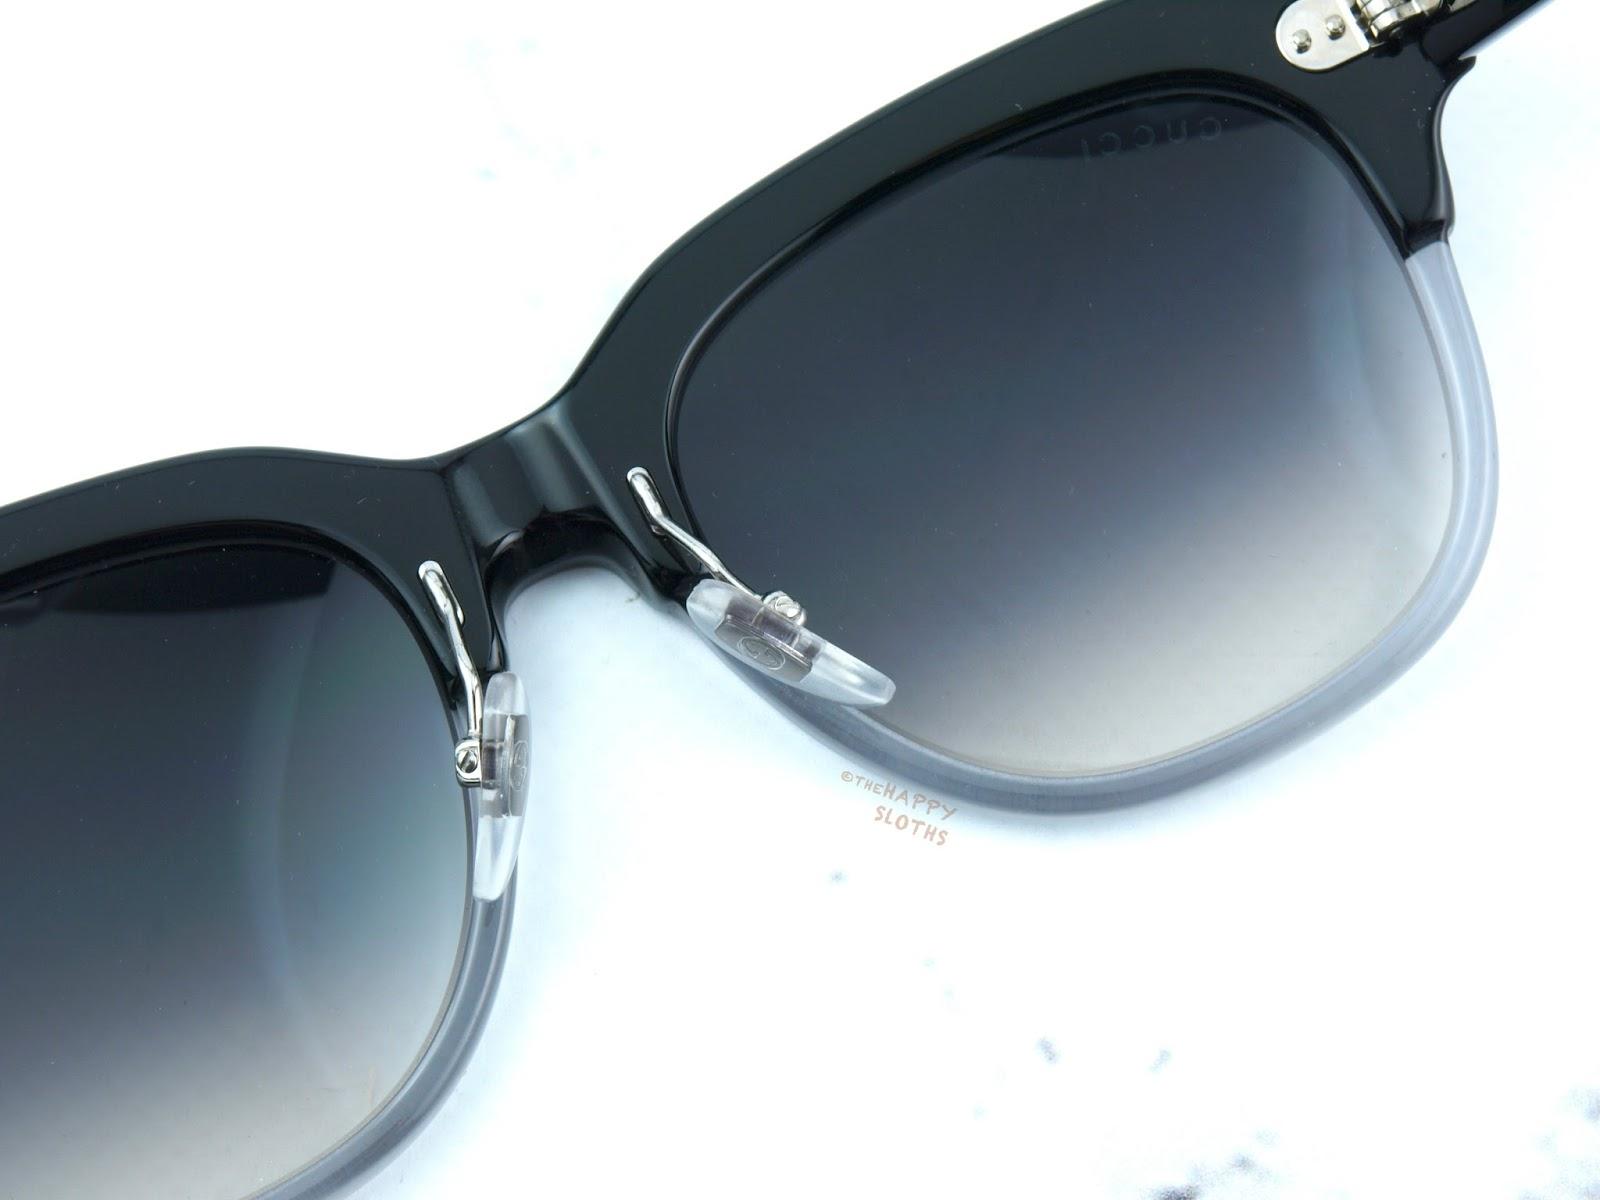 SmartBuyGlasses Review   Gucci Sunglasses GG 3744 S X9H/9C